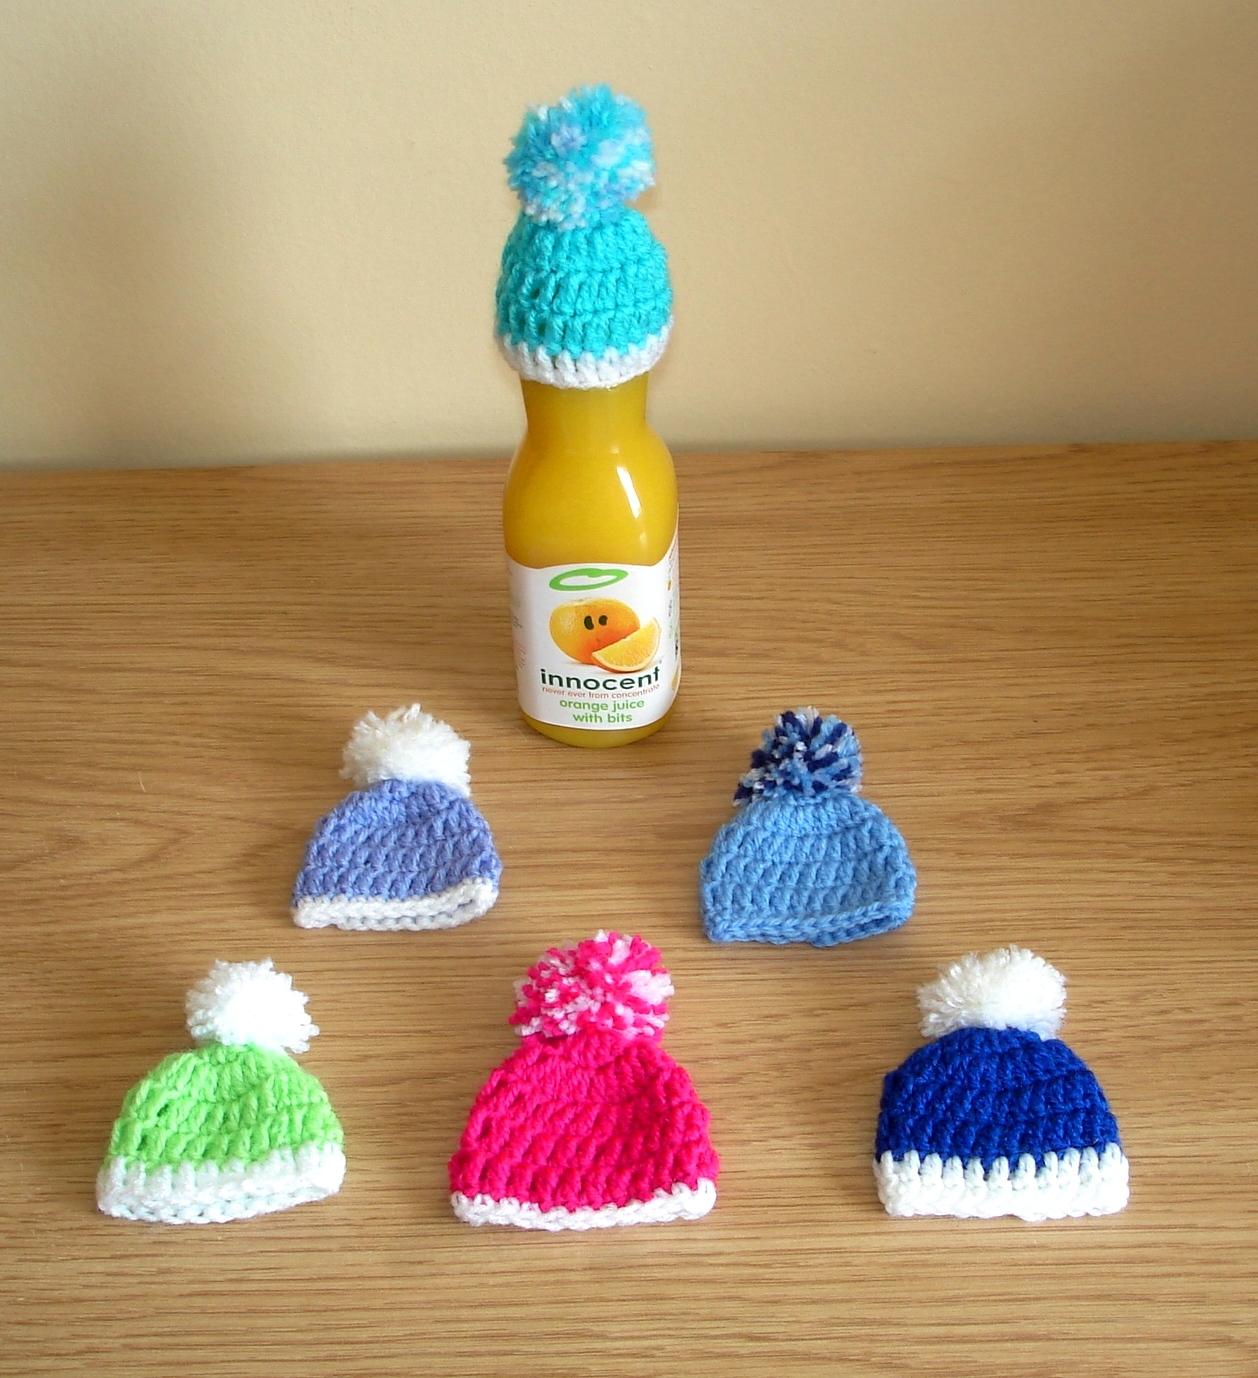 mariannas lazy daisy days: AGE UK ~ Innocent Smoothie Hats